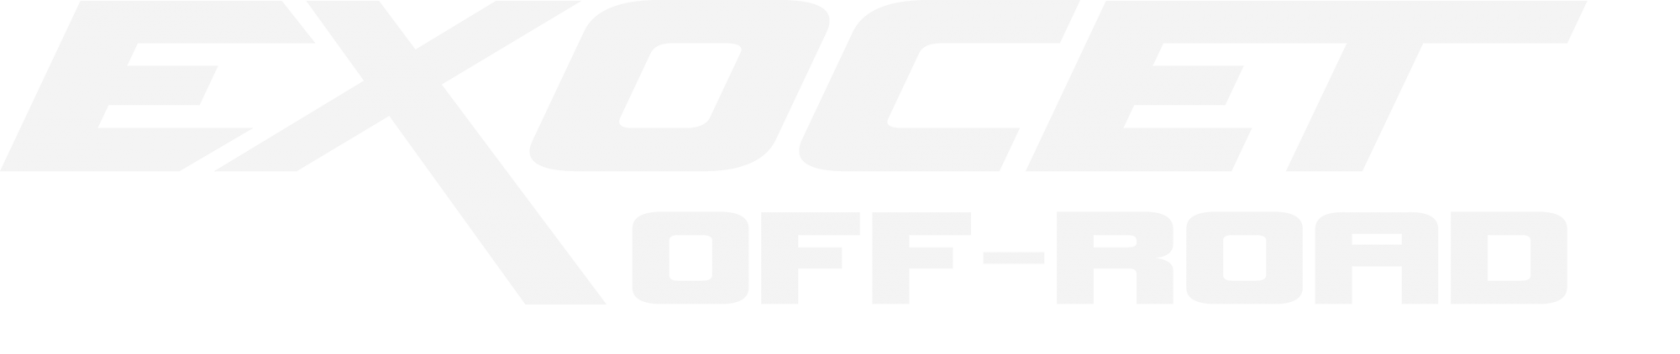 Exomotive-Off-Road-Logo-White